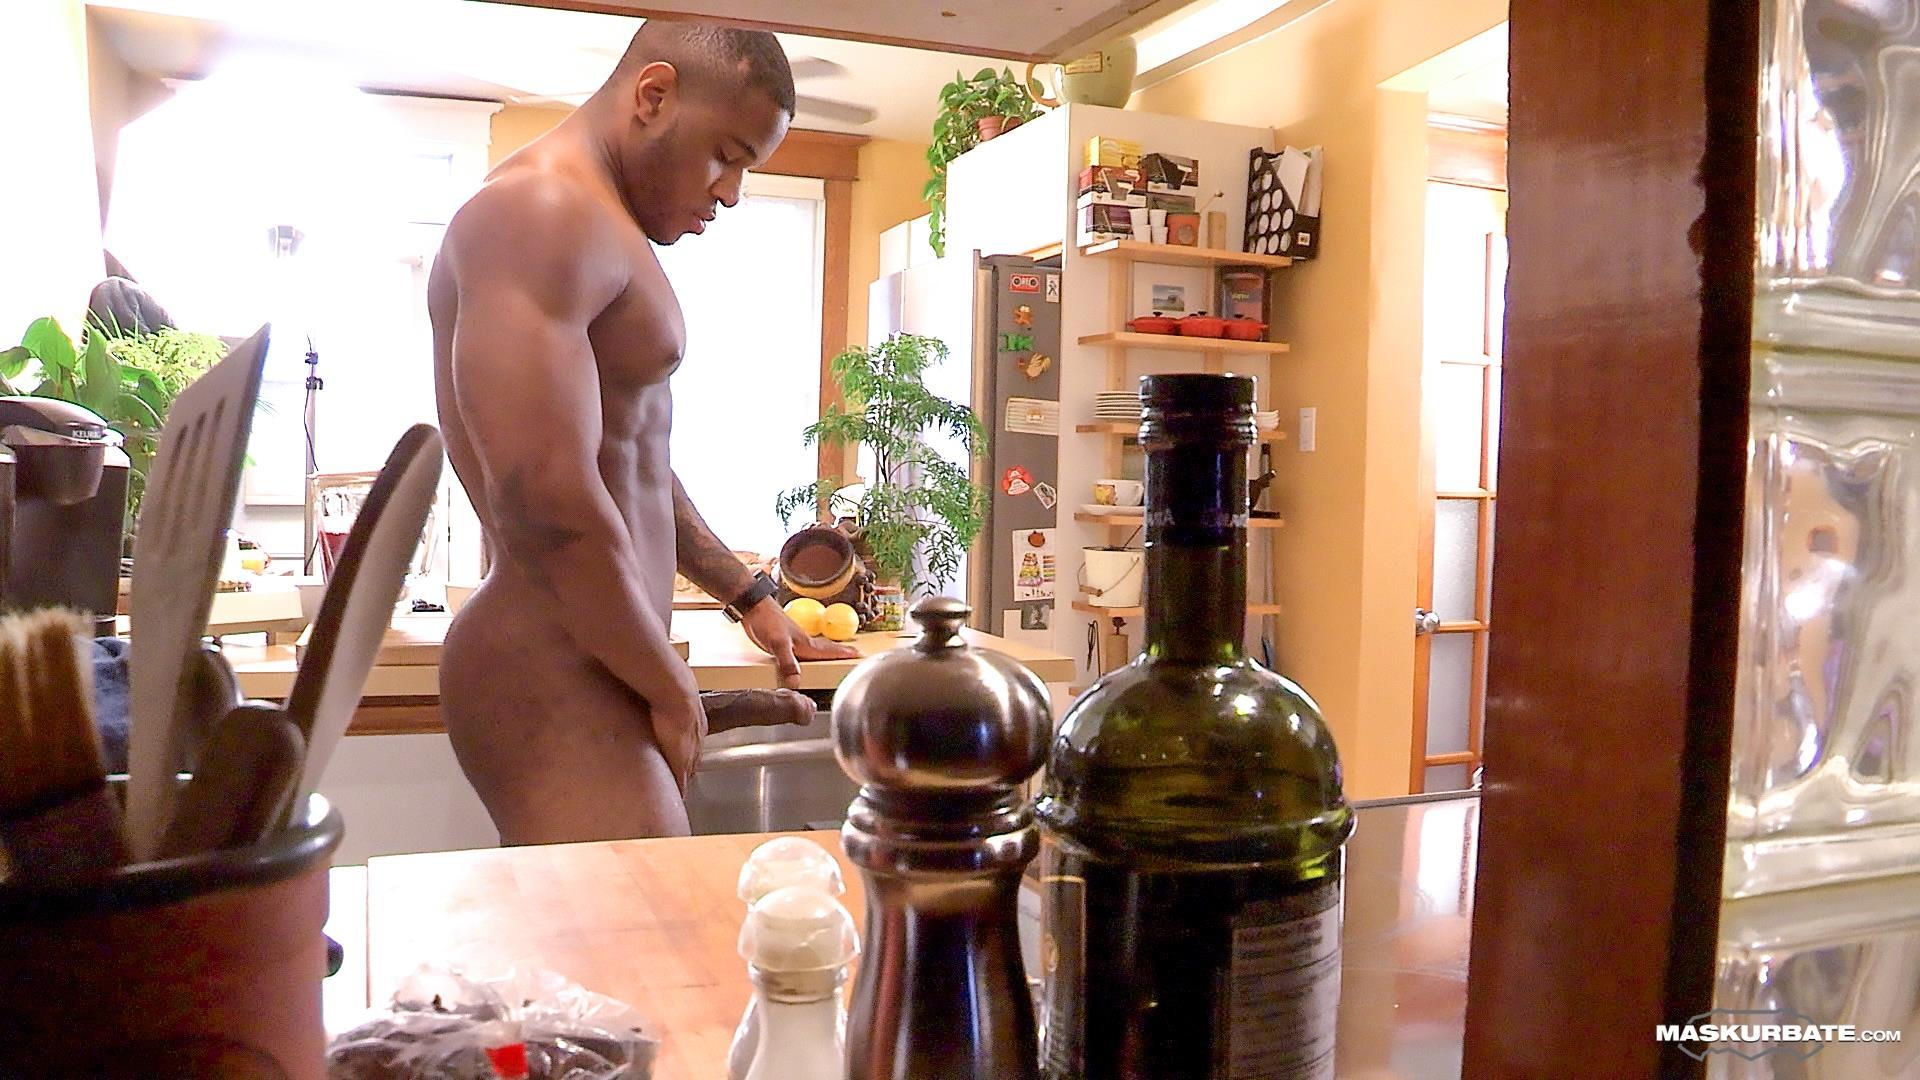 Maskurbate Adam Black Muscle Guy Jerking His Big Black Uncut Cock Amateur Gay Porn 10 Black Bodybuilder Strokes His Big Black Uncut Cock